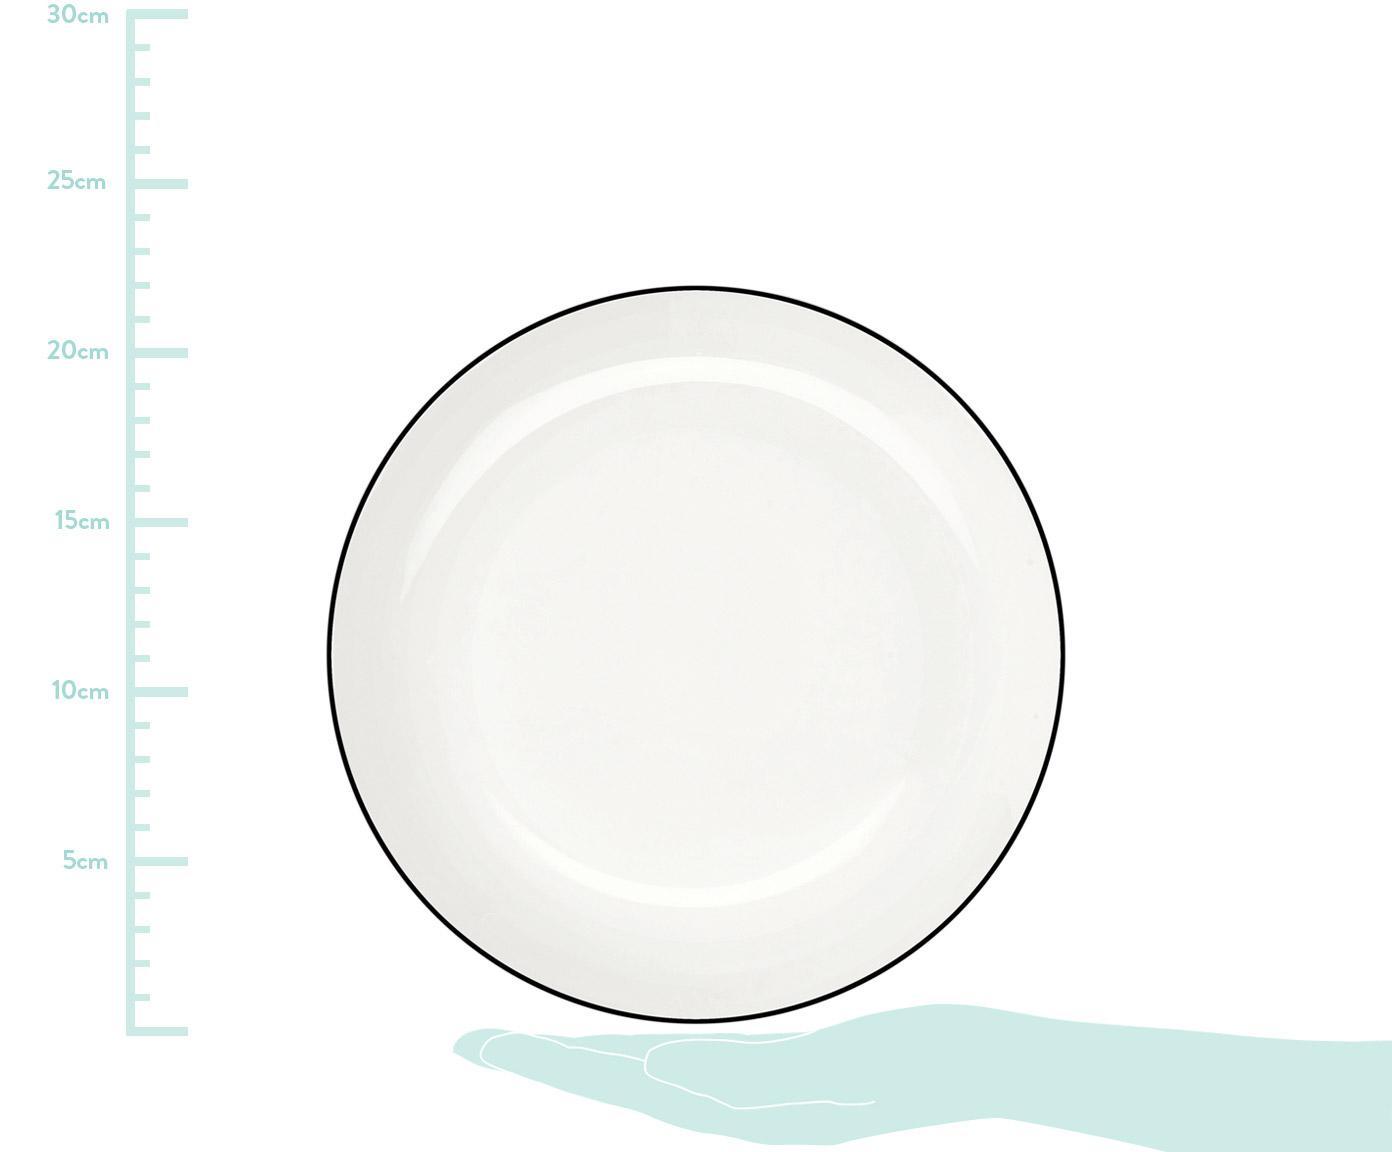 Piatto da pasta á table ligne noir 4 pz, Porcellana Fine Bone China, Bianco Bordo: nero, Ø 22 x Alt. 5 cm